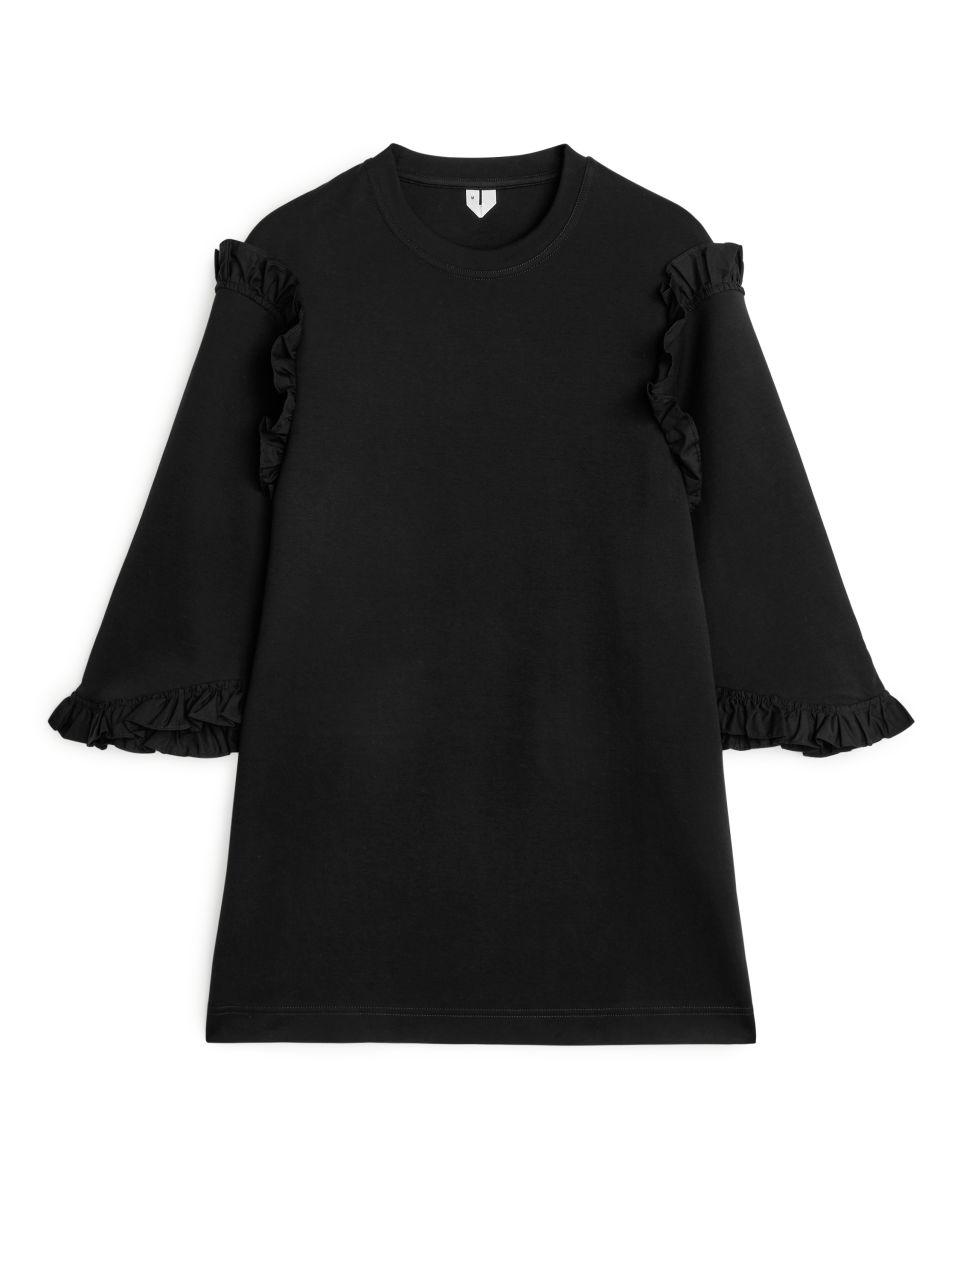 Oversized Frill T-Shirt - Black